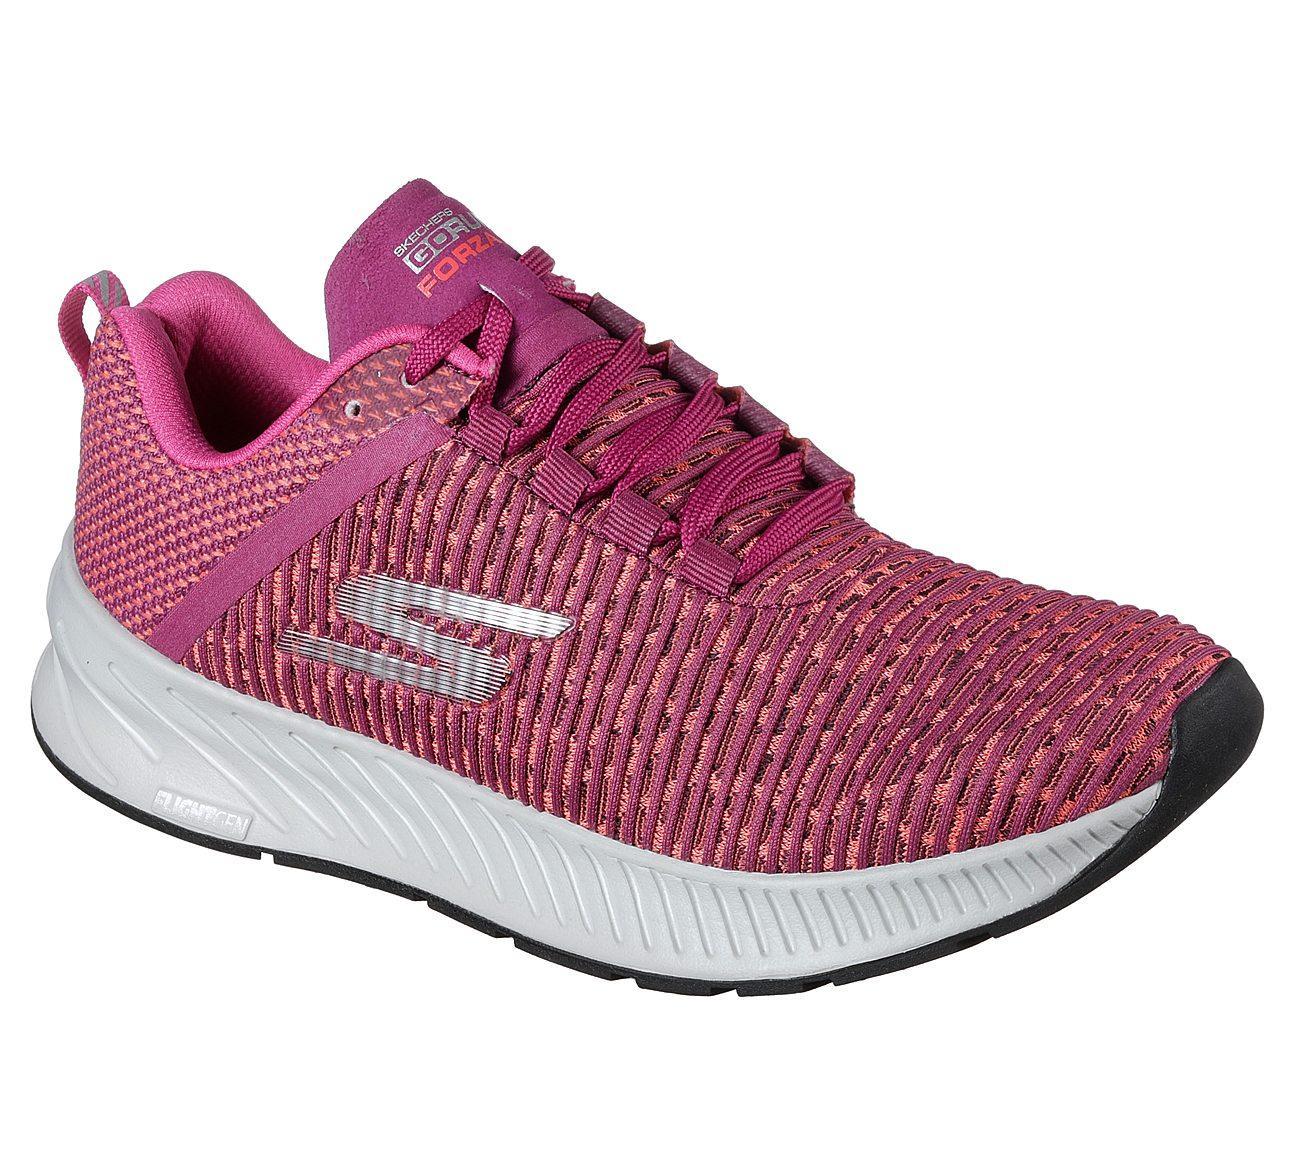 Skechers - GORun Forza 3 Sepatu Lari Wanita - Pink a298119fcf